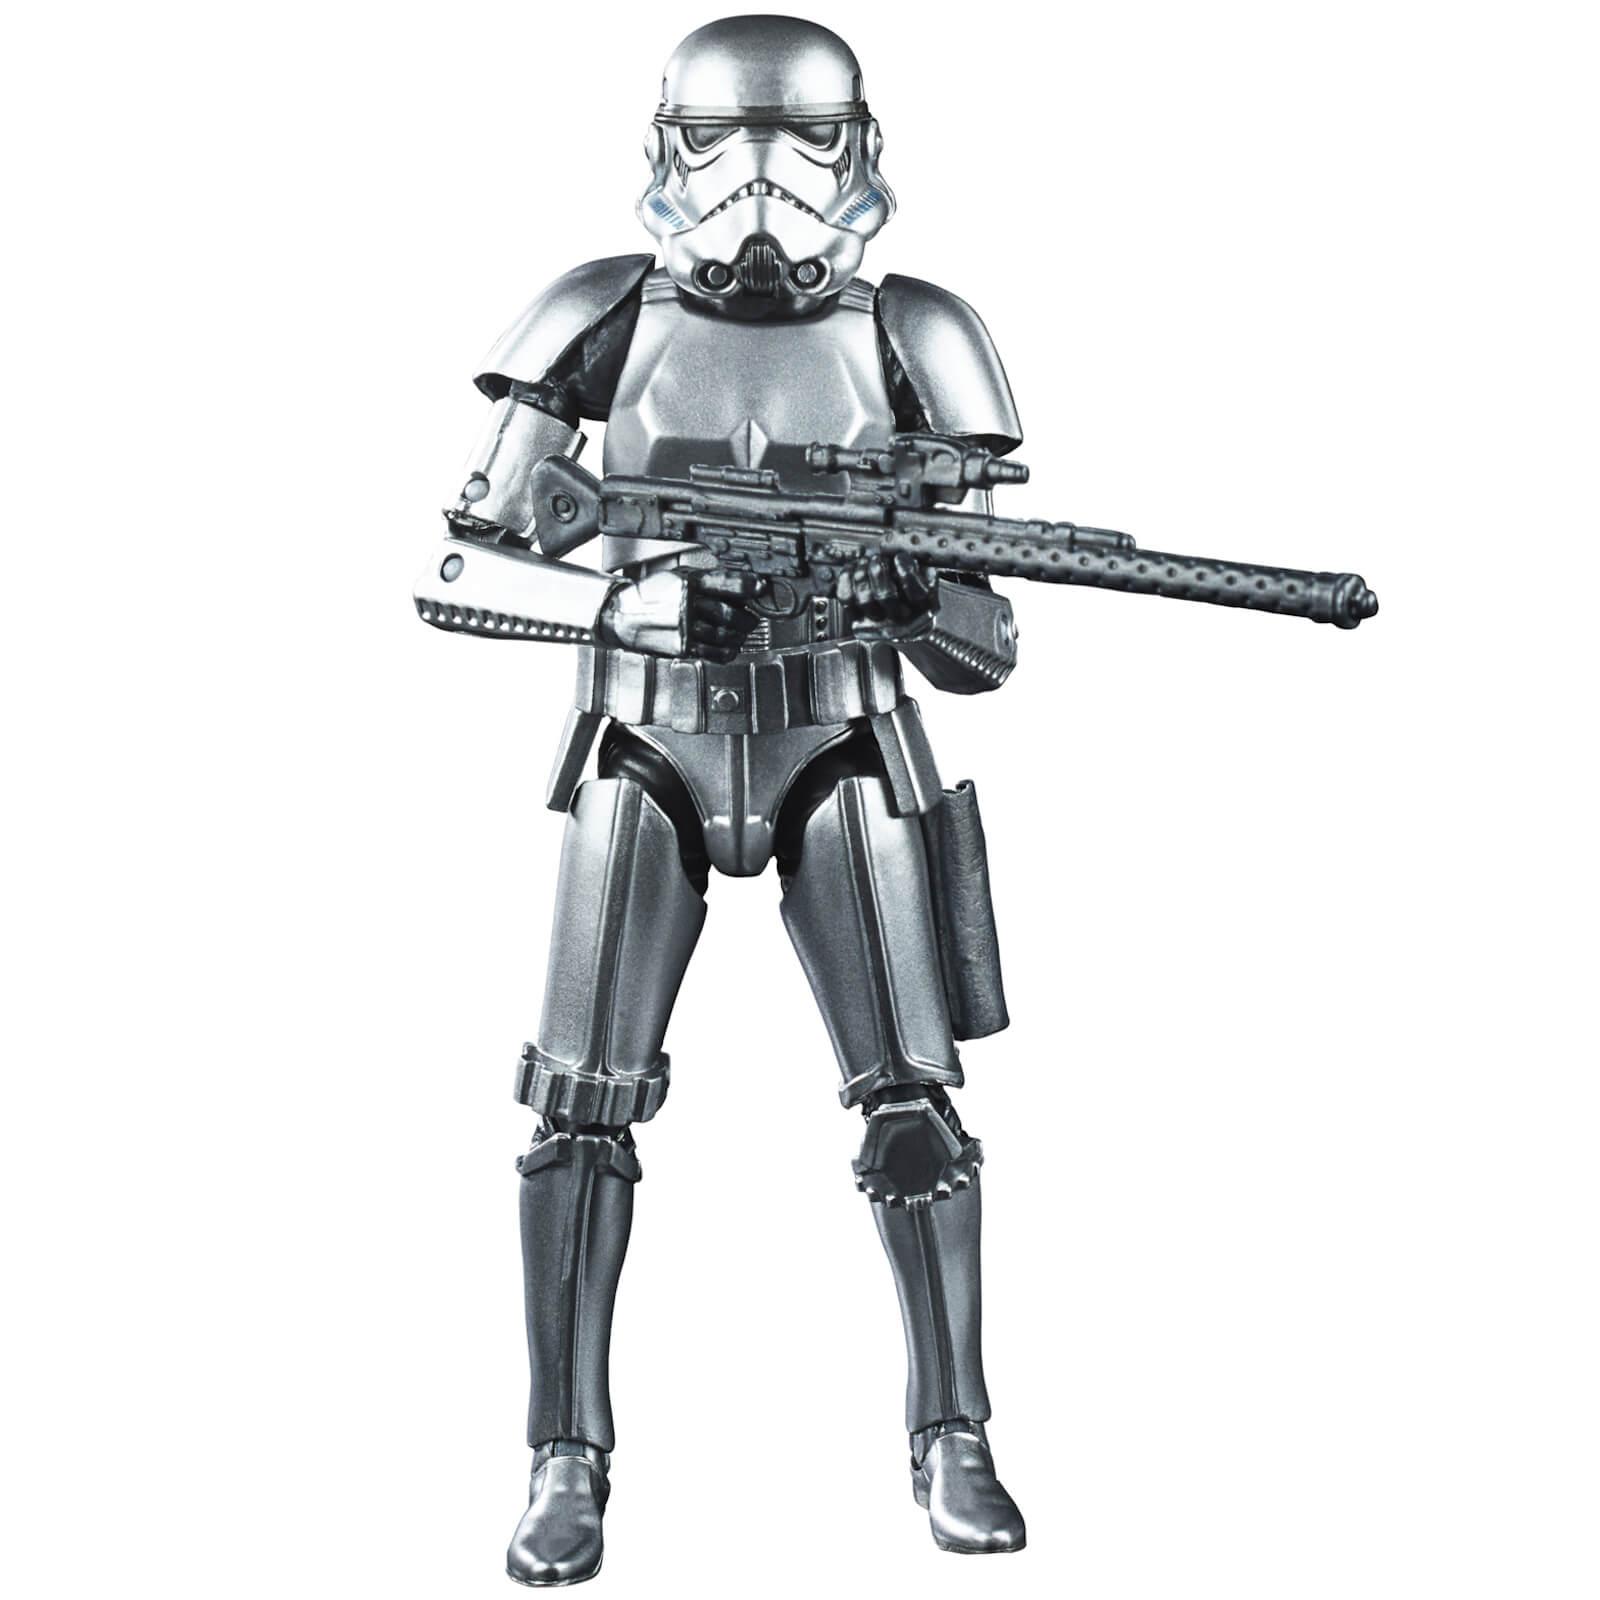 Image of Hasbro Star Wars The Black Series Carbonized Metallic Stormtrooper Action Figure